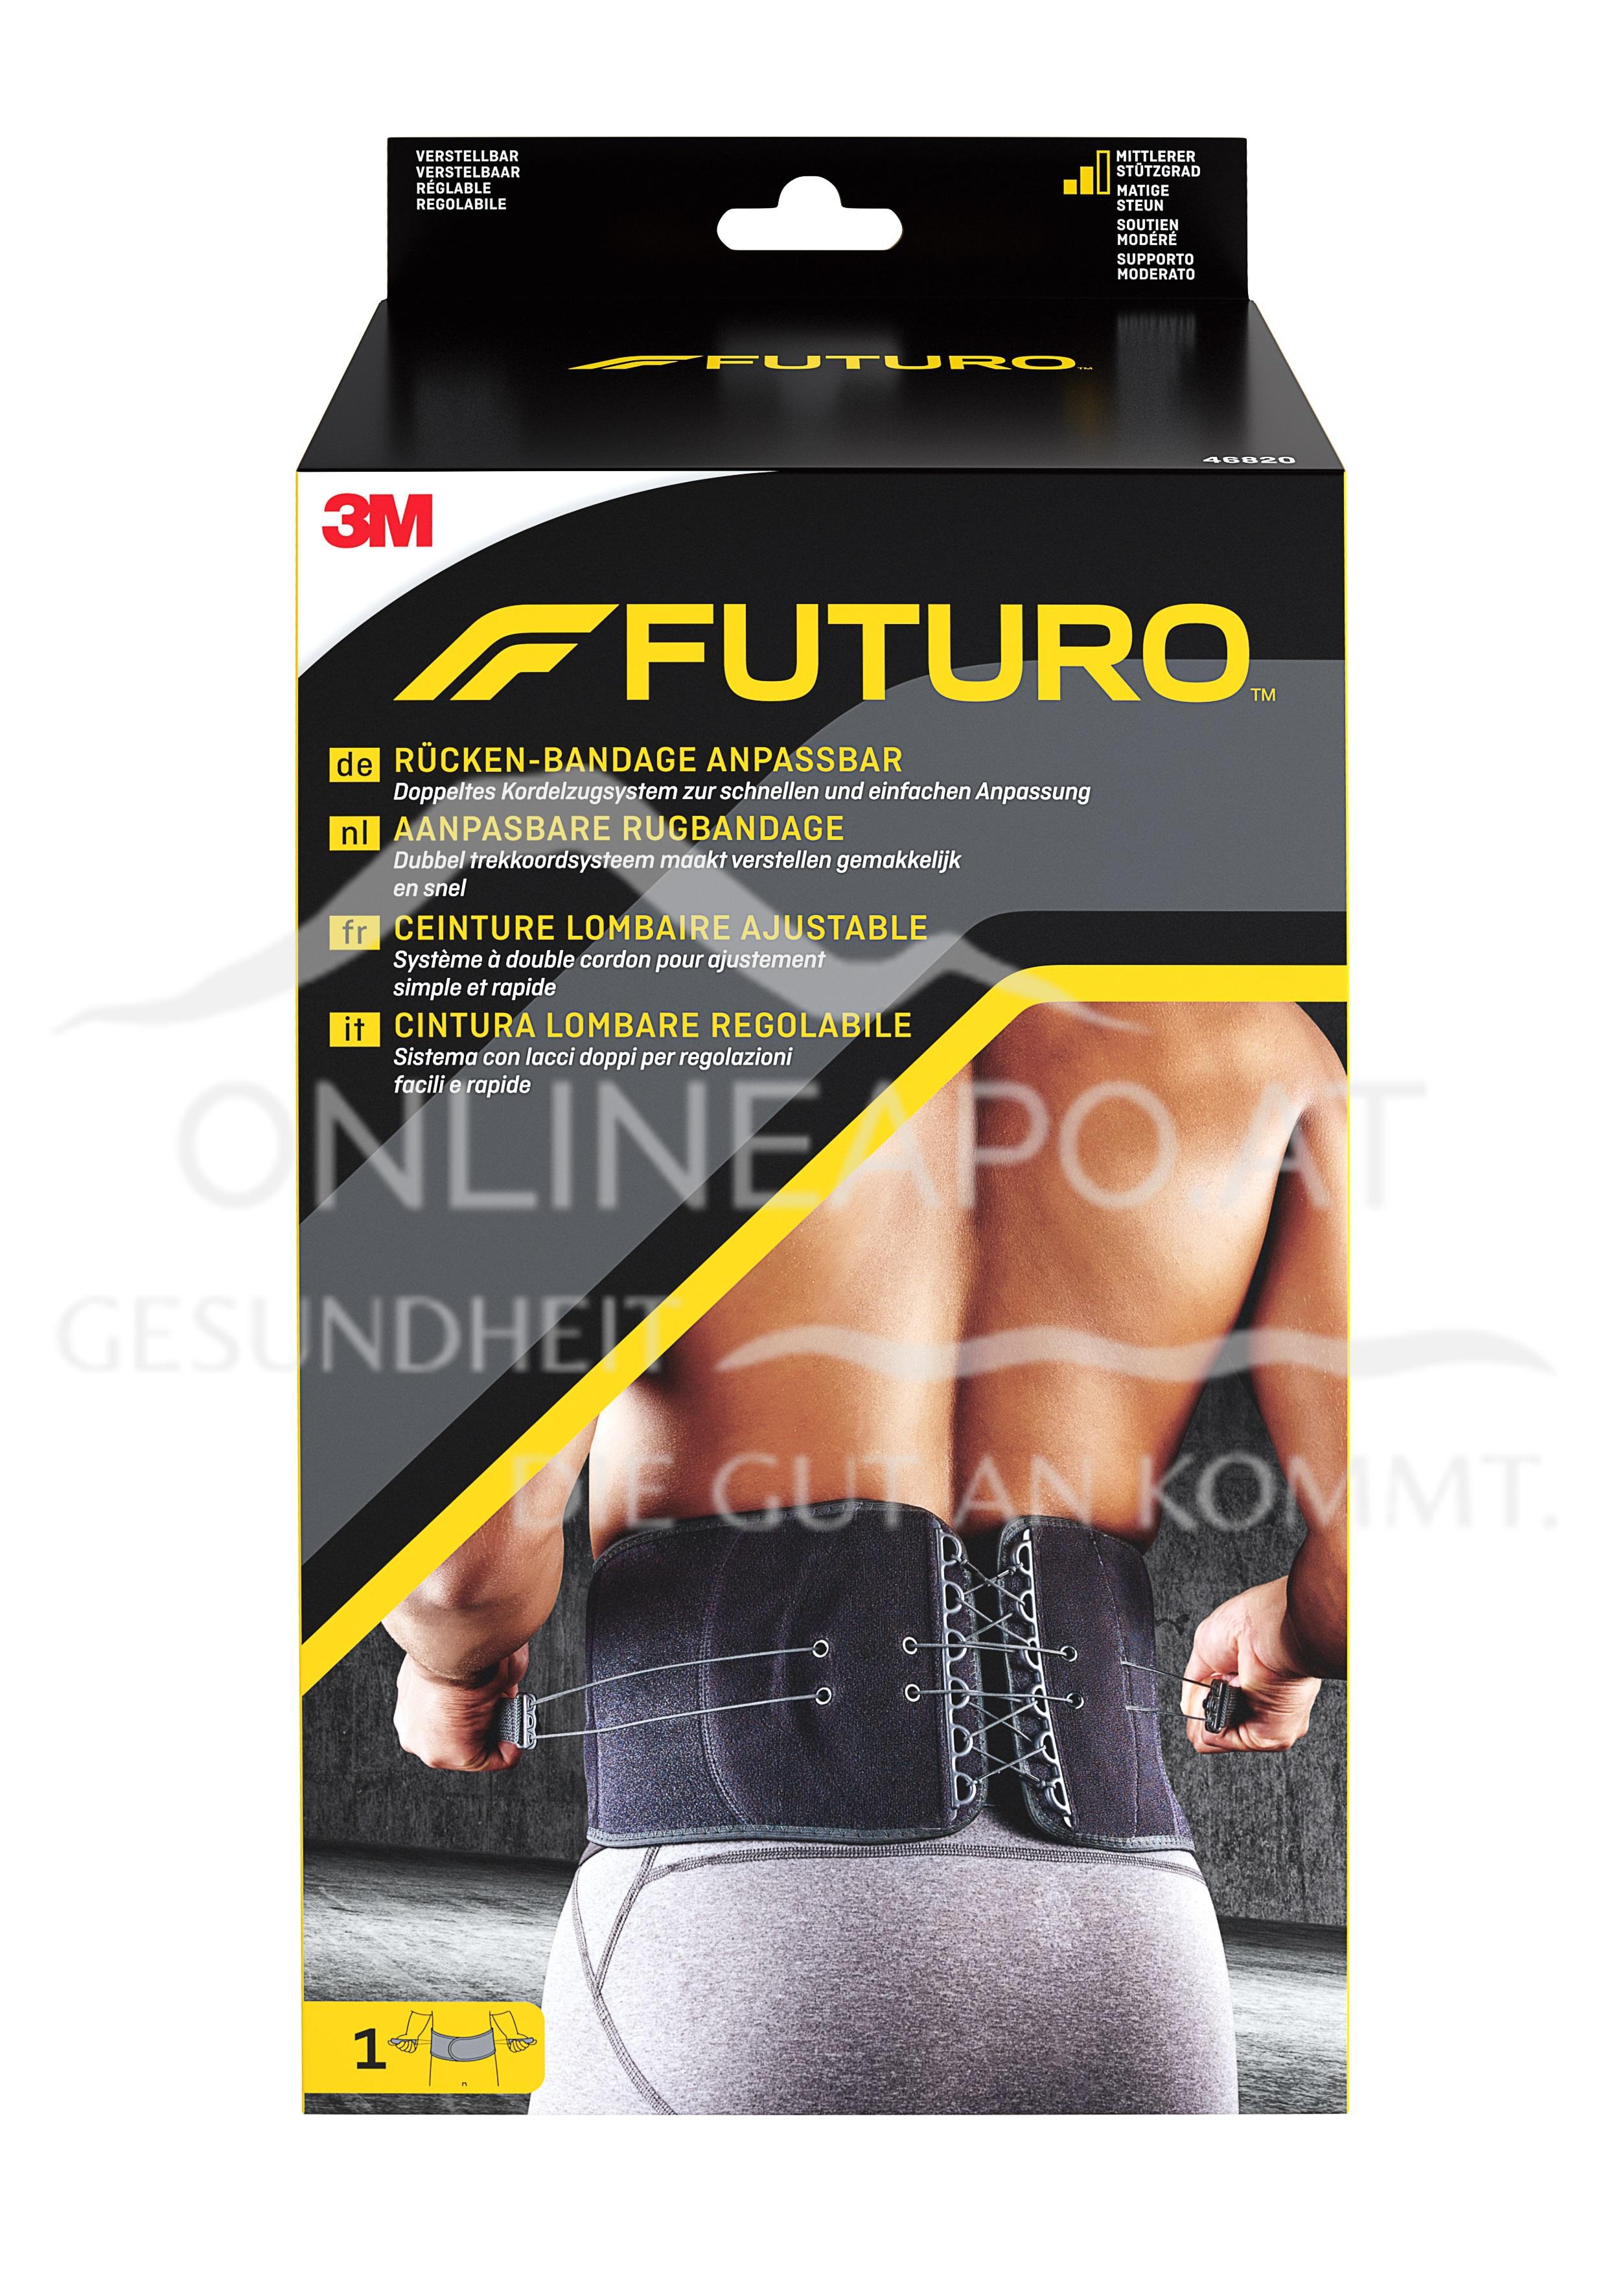 Futuro Rücken-Bandage anpassbar one size